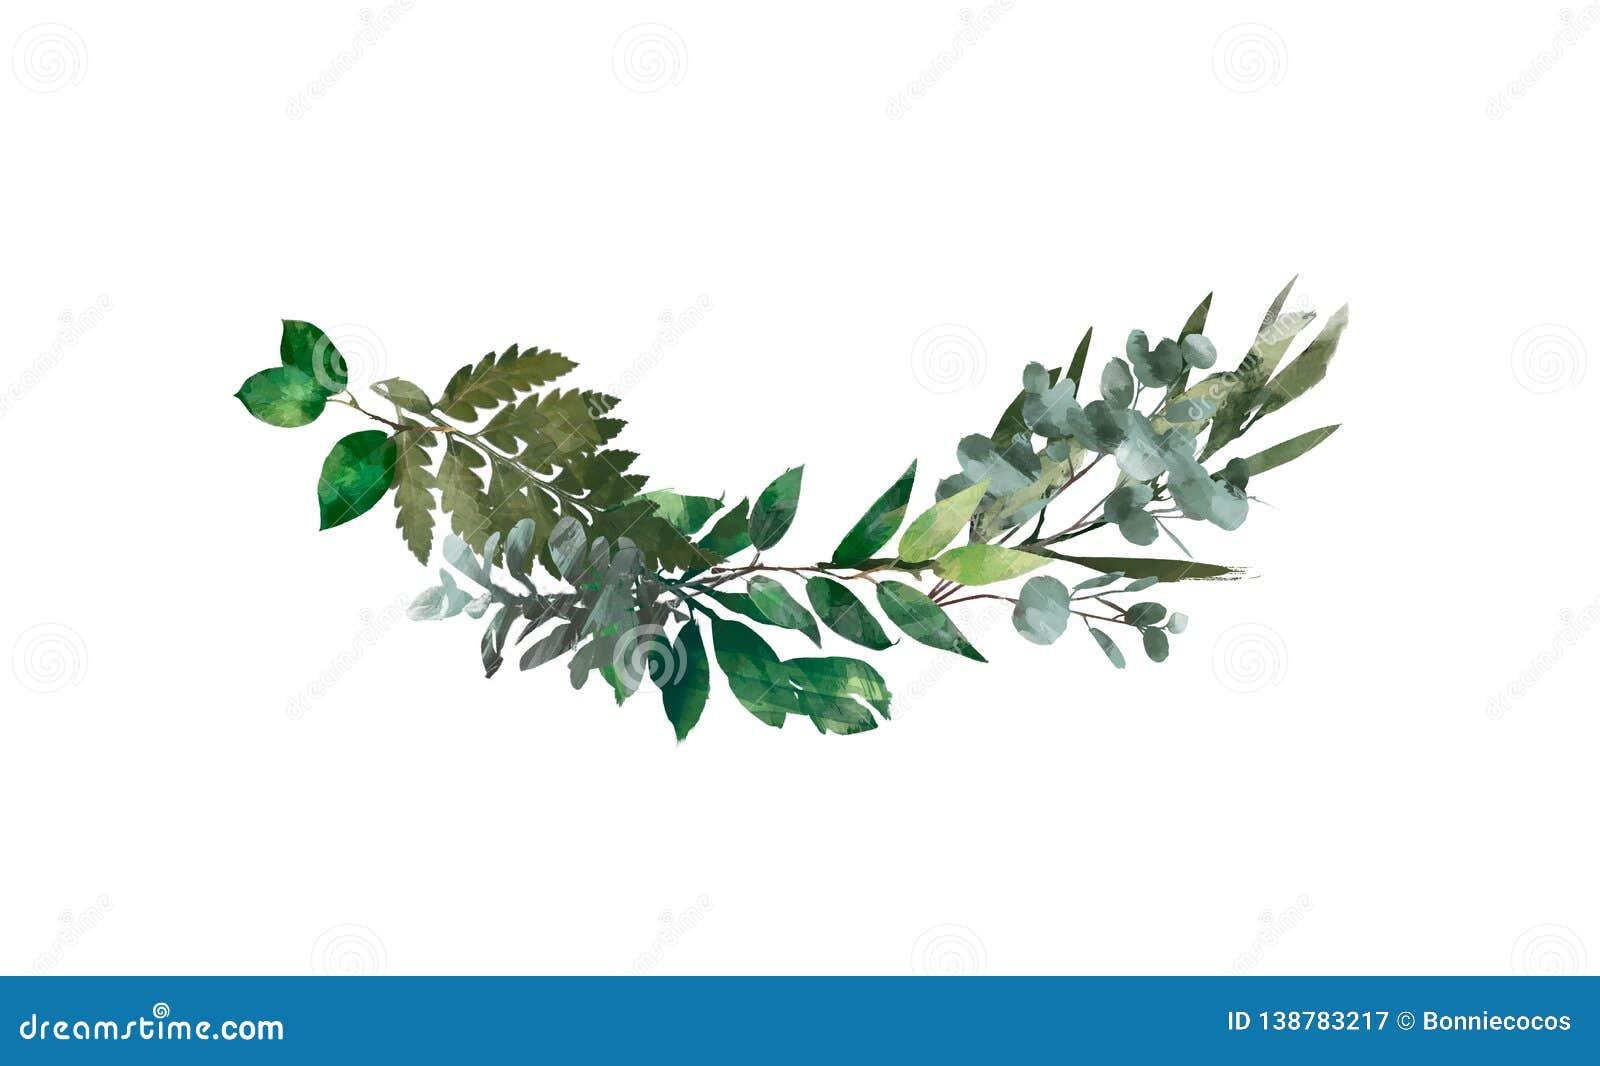 Watercolor modern decorative element. Eucalyptus round Green leaf Wreath, greenery branches, garland, border, frame, elegant